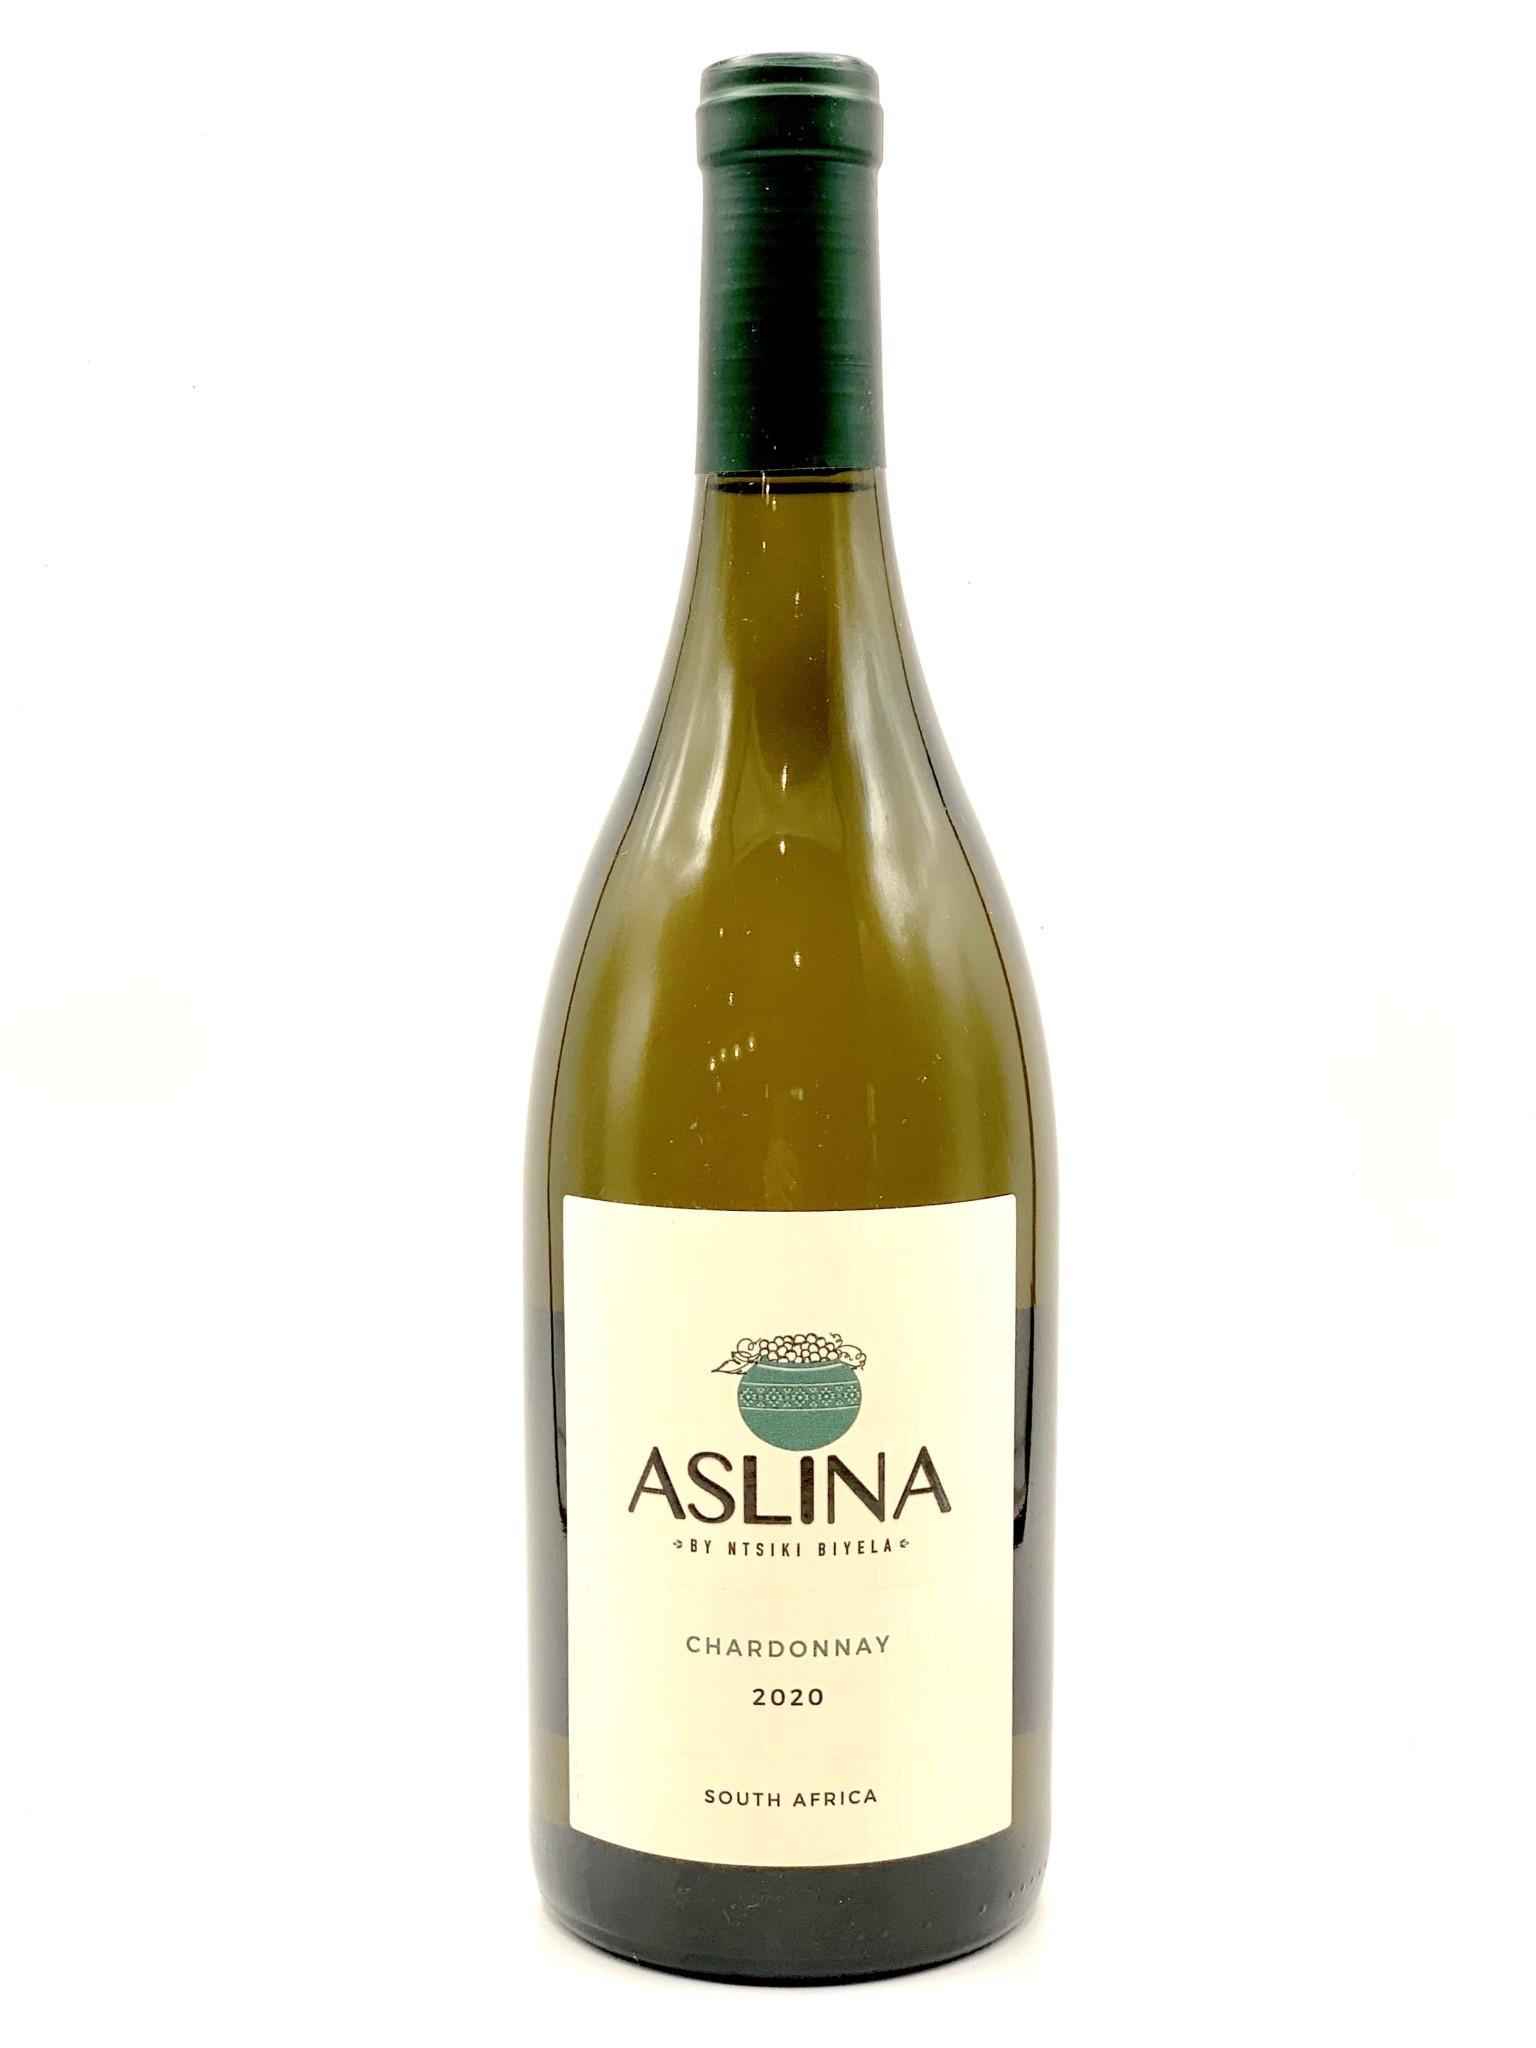 South African Chardonnay 2020 Aslina by Ntsiki Biyela  750ml